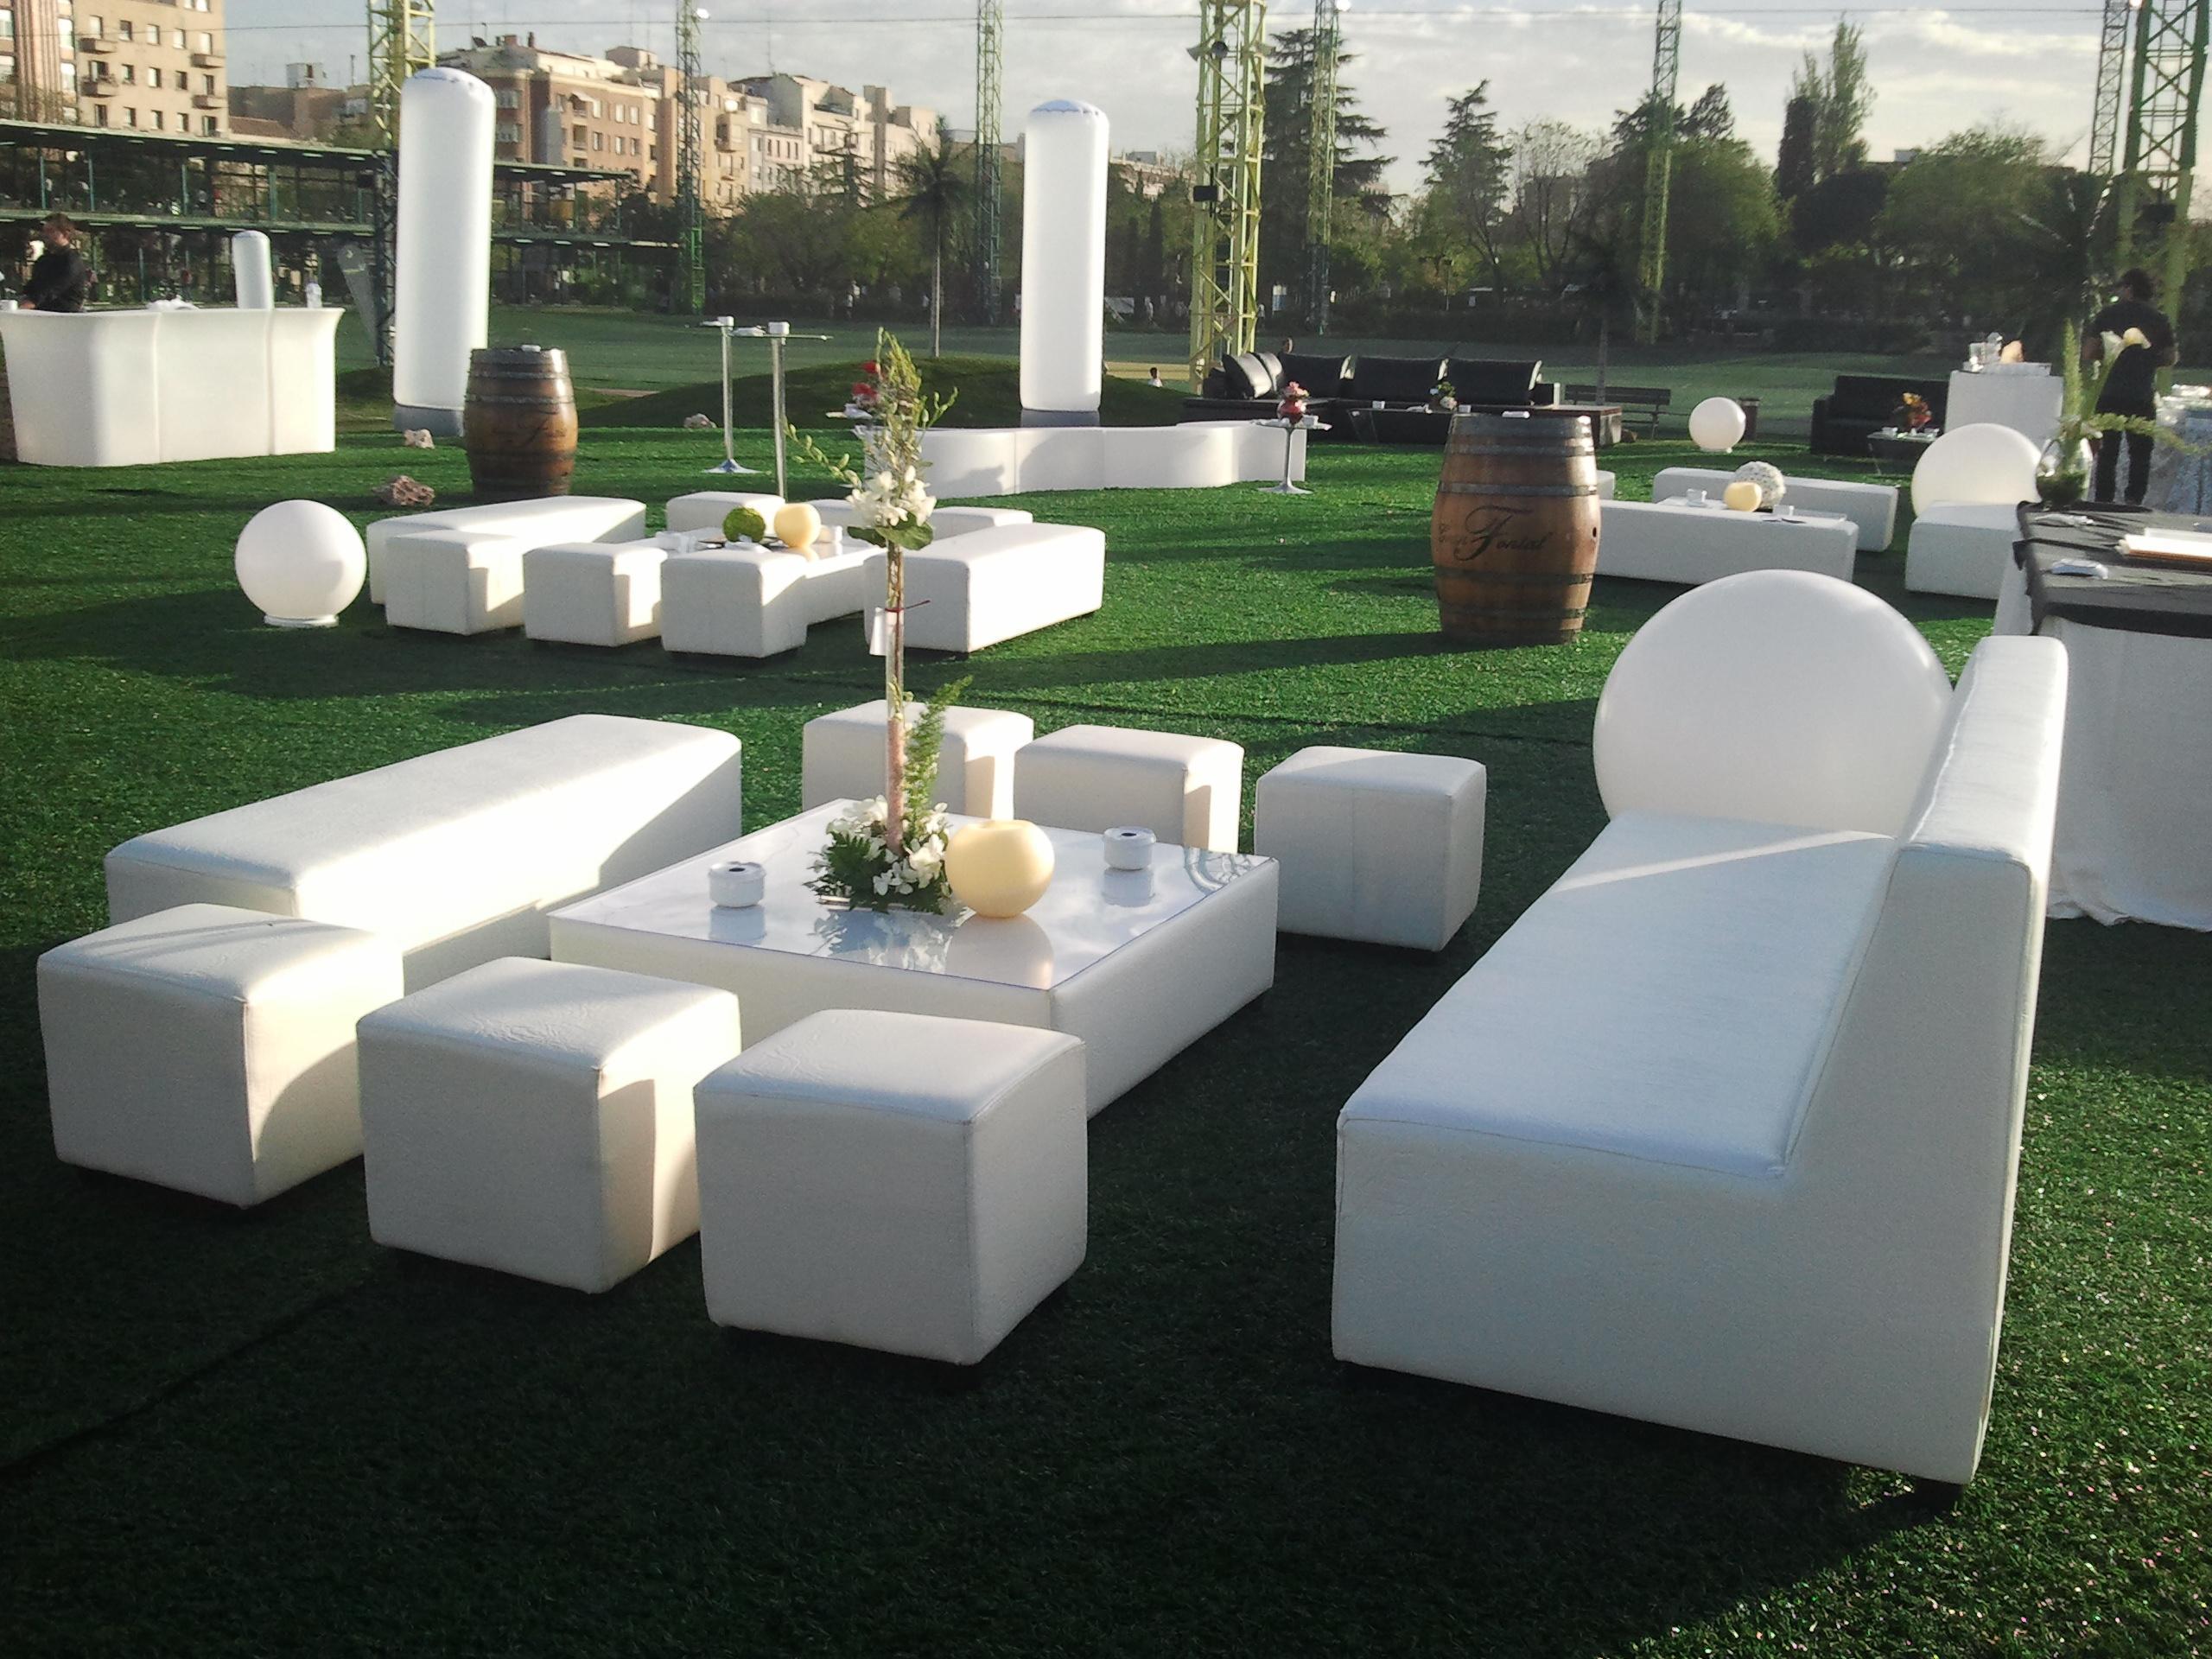 Espacios chill out alquiler de muebles crea tu espacio - Muebles chill out baratos ...